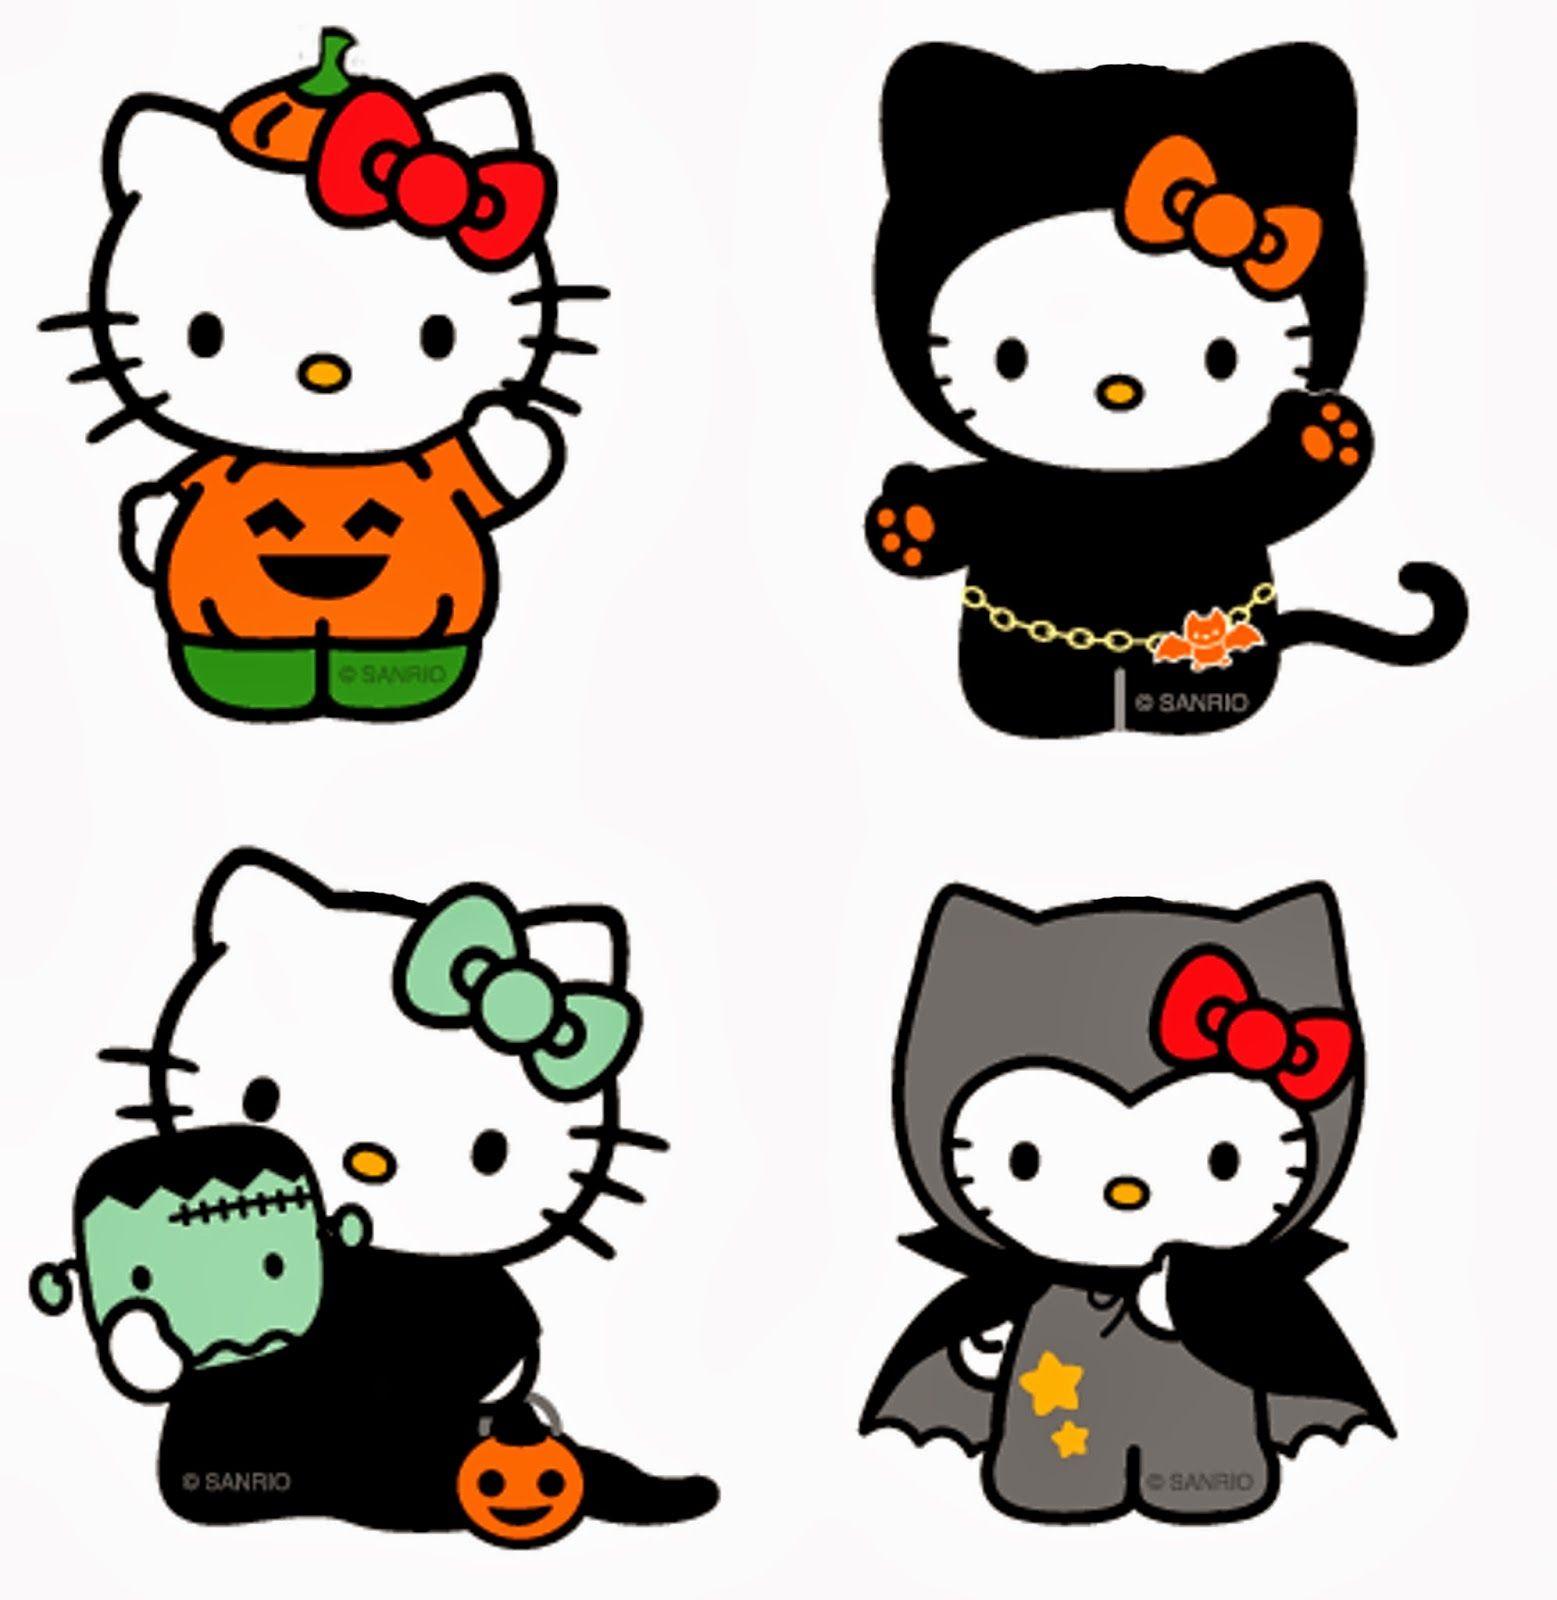 Free Hello Kitty Clipart No 4 Halloween Wallpapers In Hd Hello Kitty Clipart Hello Kitty Halloween Hello Kitty Tattoos